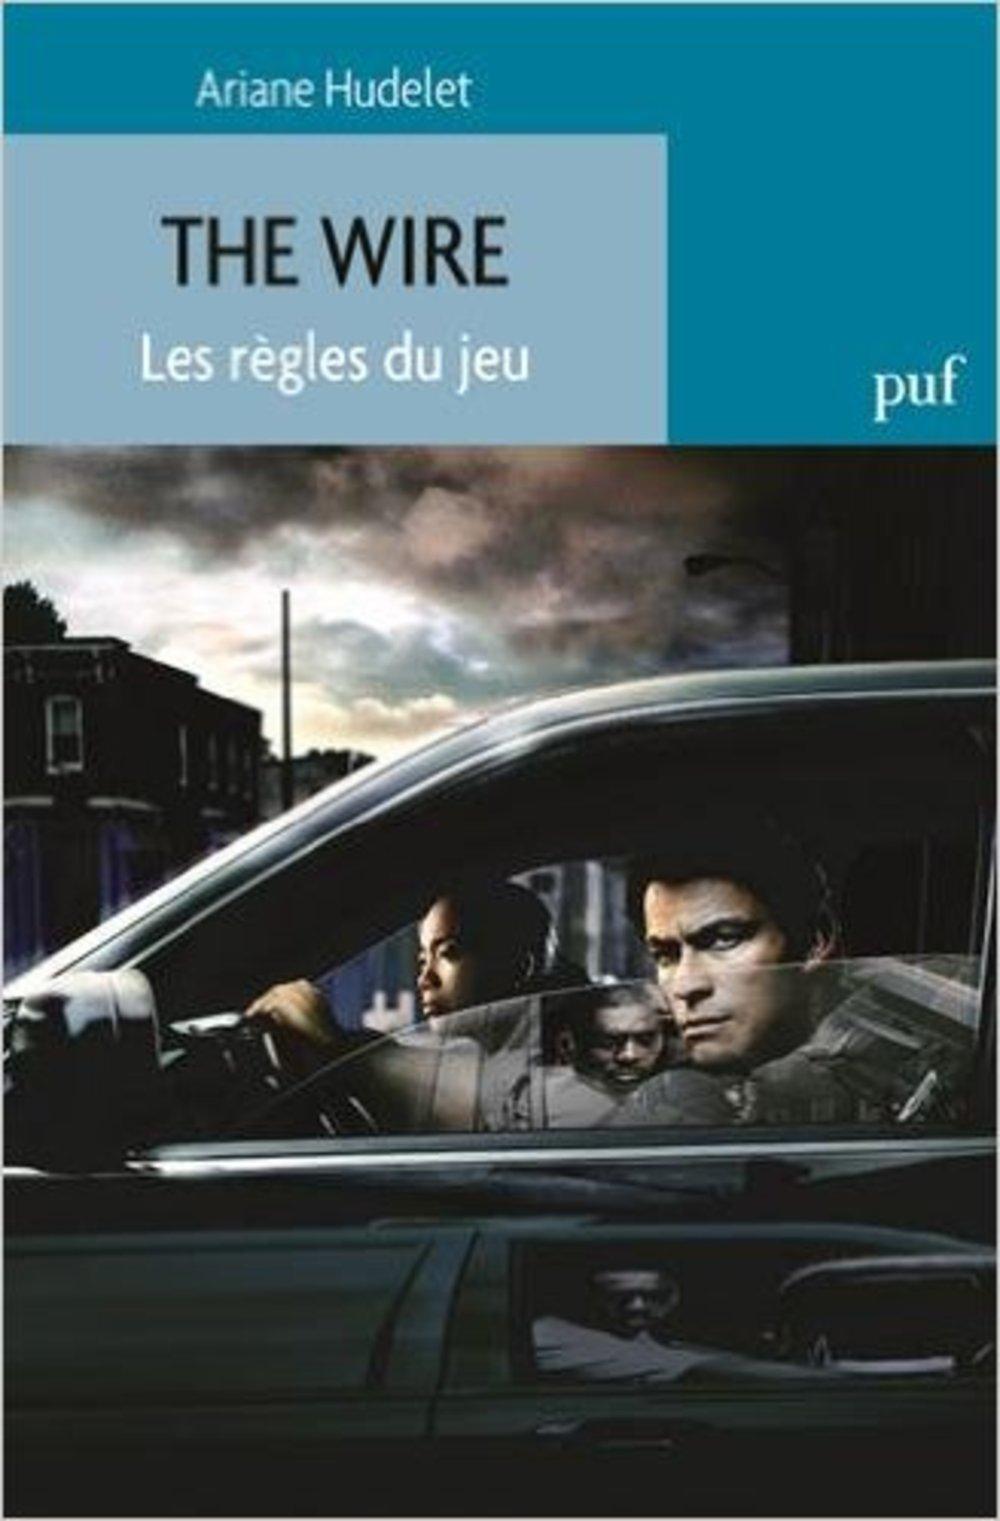 Favori Amazon.fr - The Wire : Les règles du jeu - Ariane Hudelet - Livres OG73